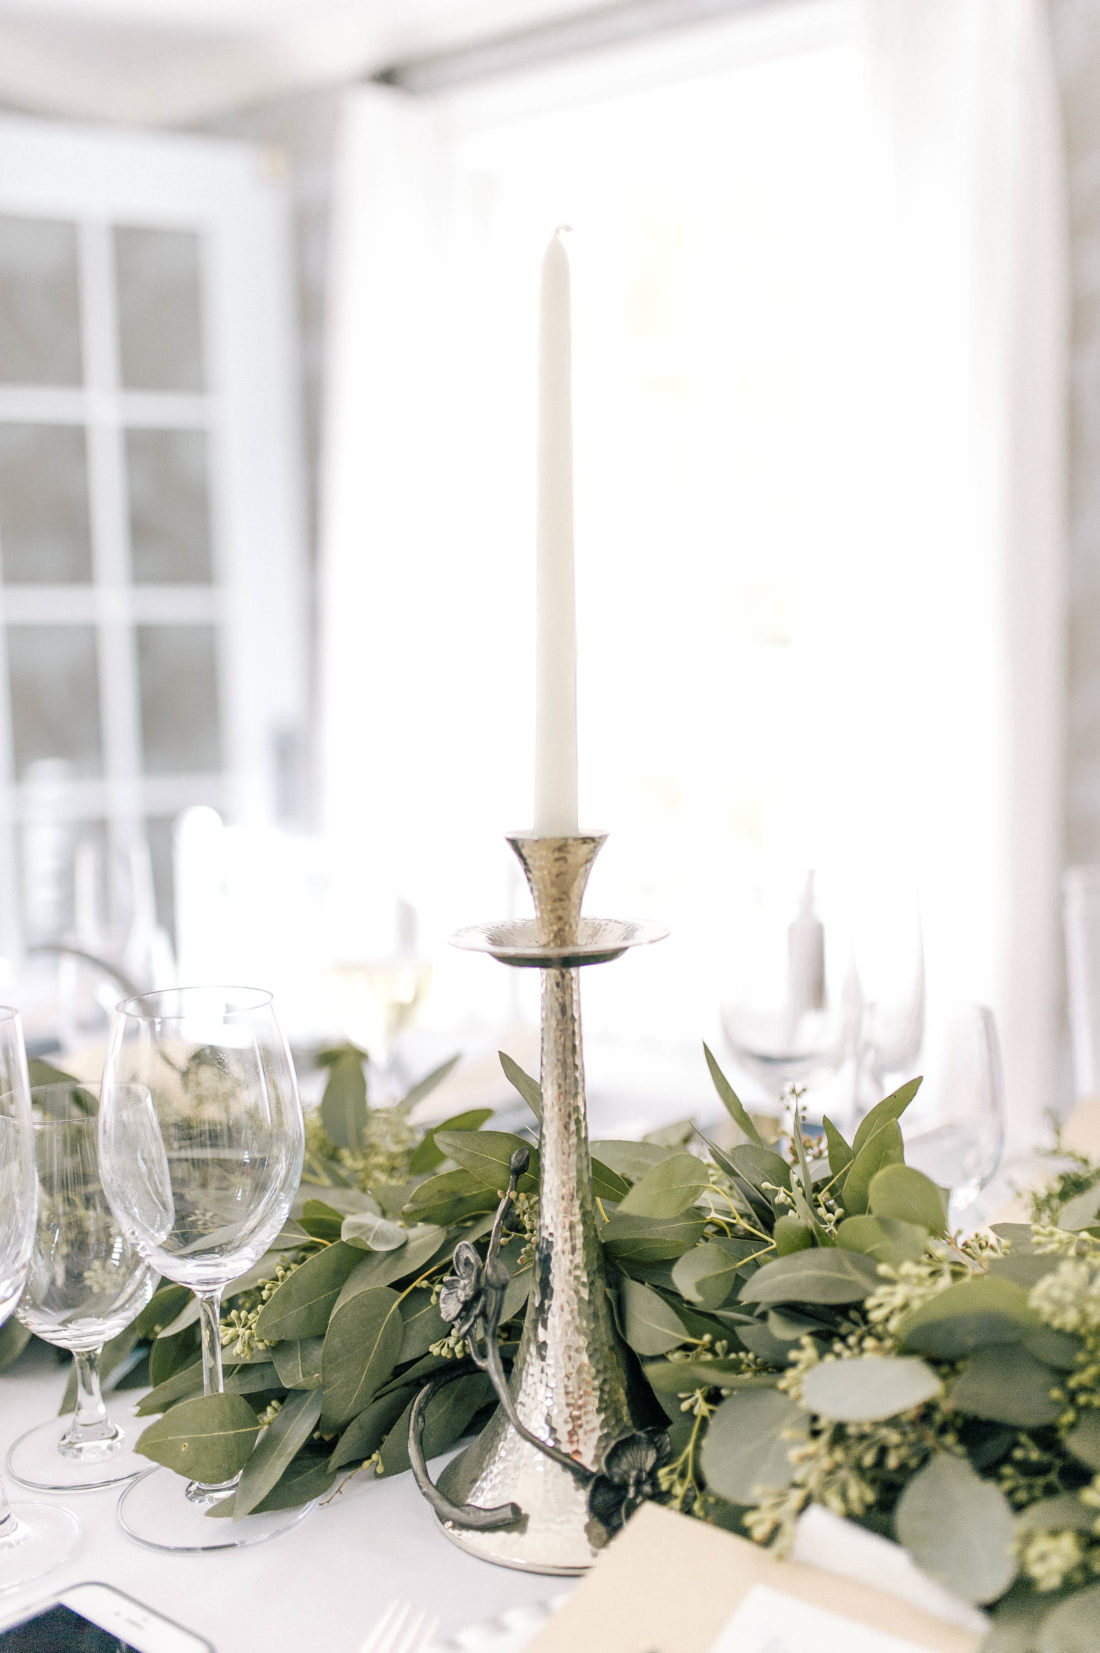 Silver candlesticks amidst the foliage at the Friendsgiving at Eva Amurri Martino's Connecticut home